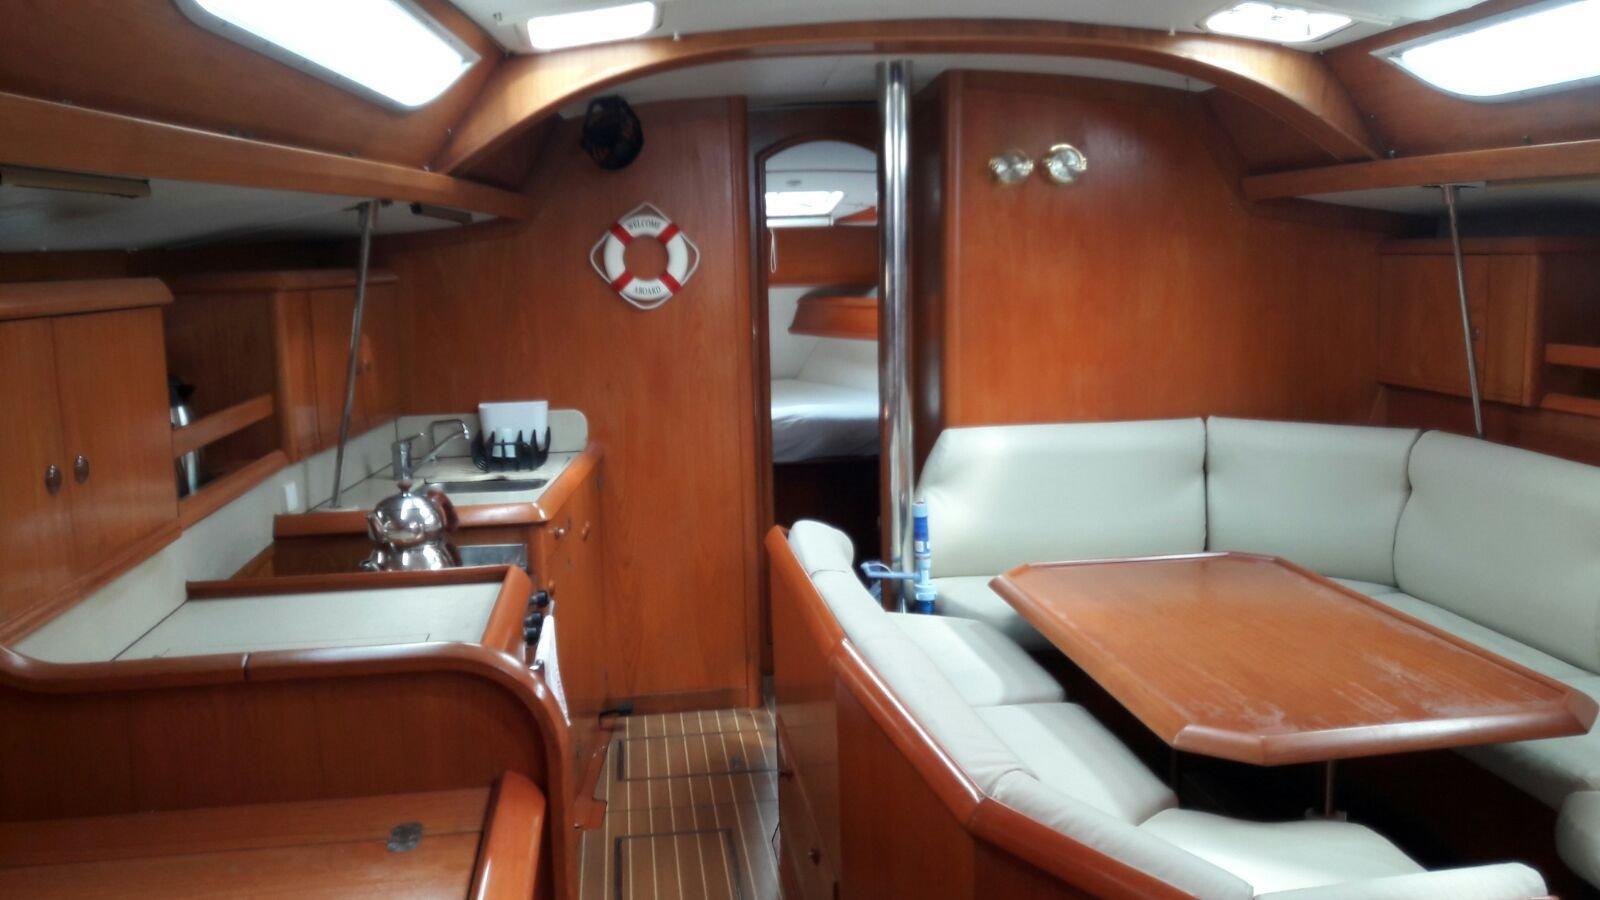 Jeanneau Sun Odyssey 42 2 Boat For Sale